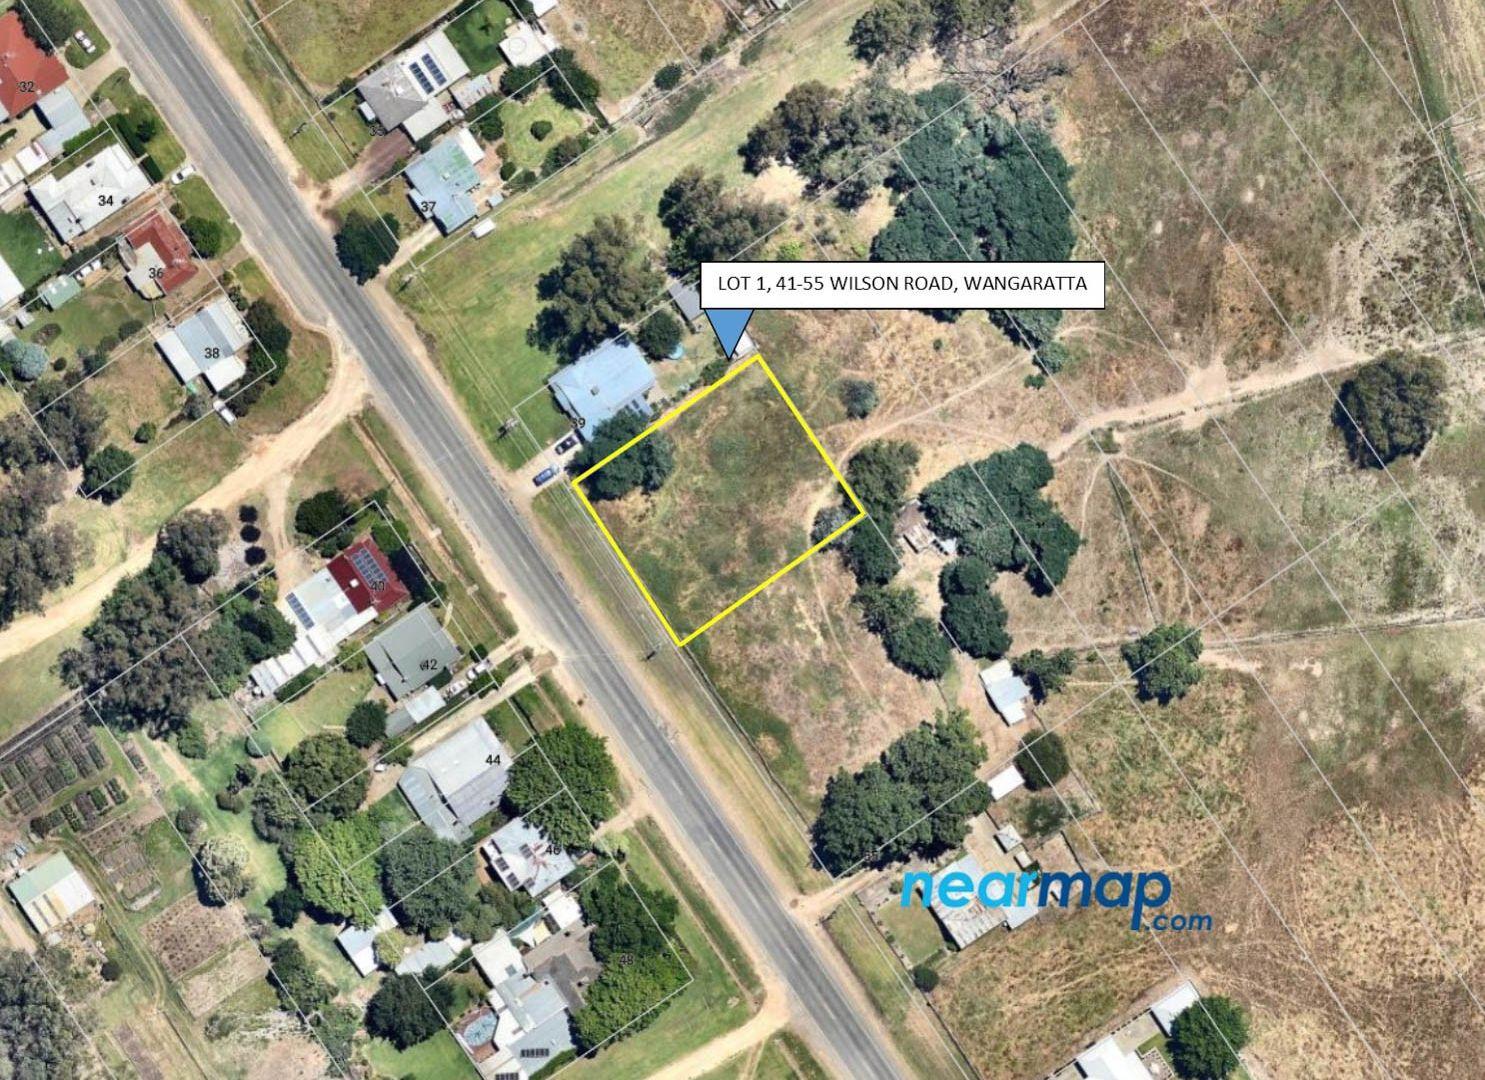 Lot 1/41-55 Wilson Road, Wangaratta VIC 3677, Image 2